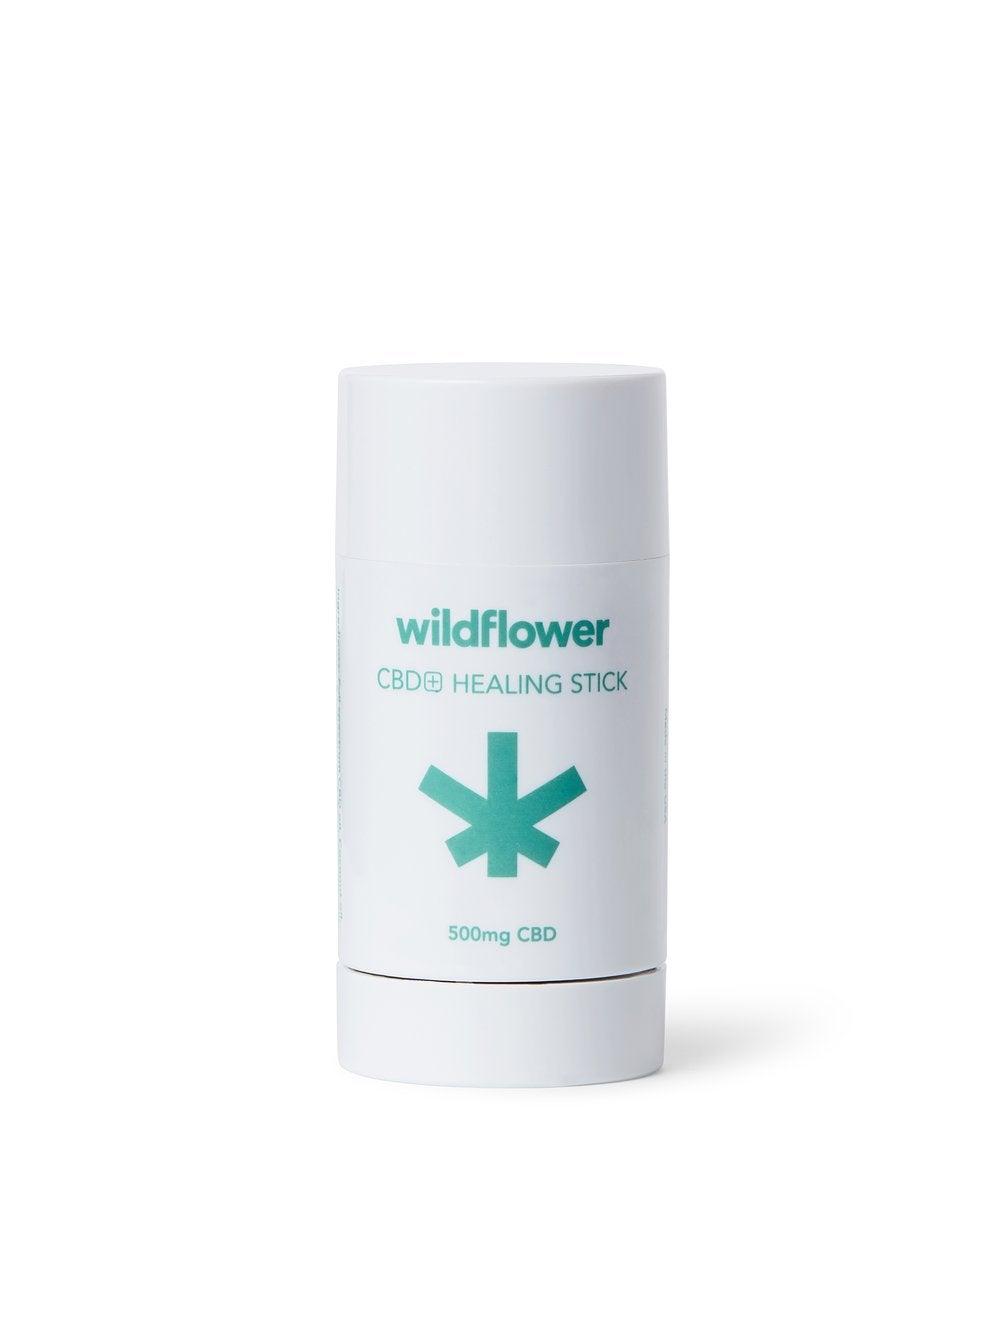 Wildflower Healing Stick